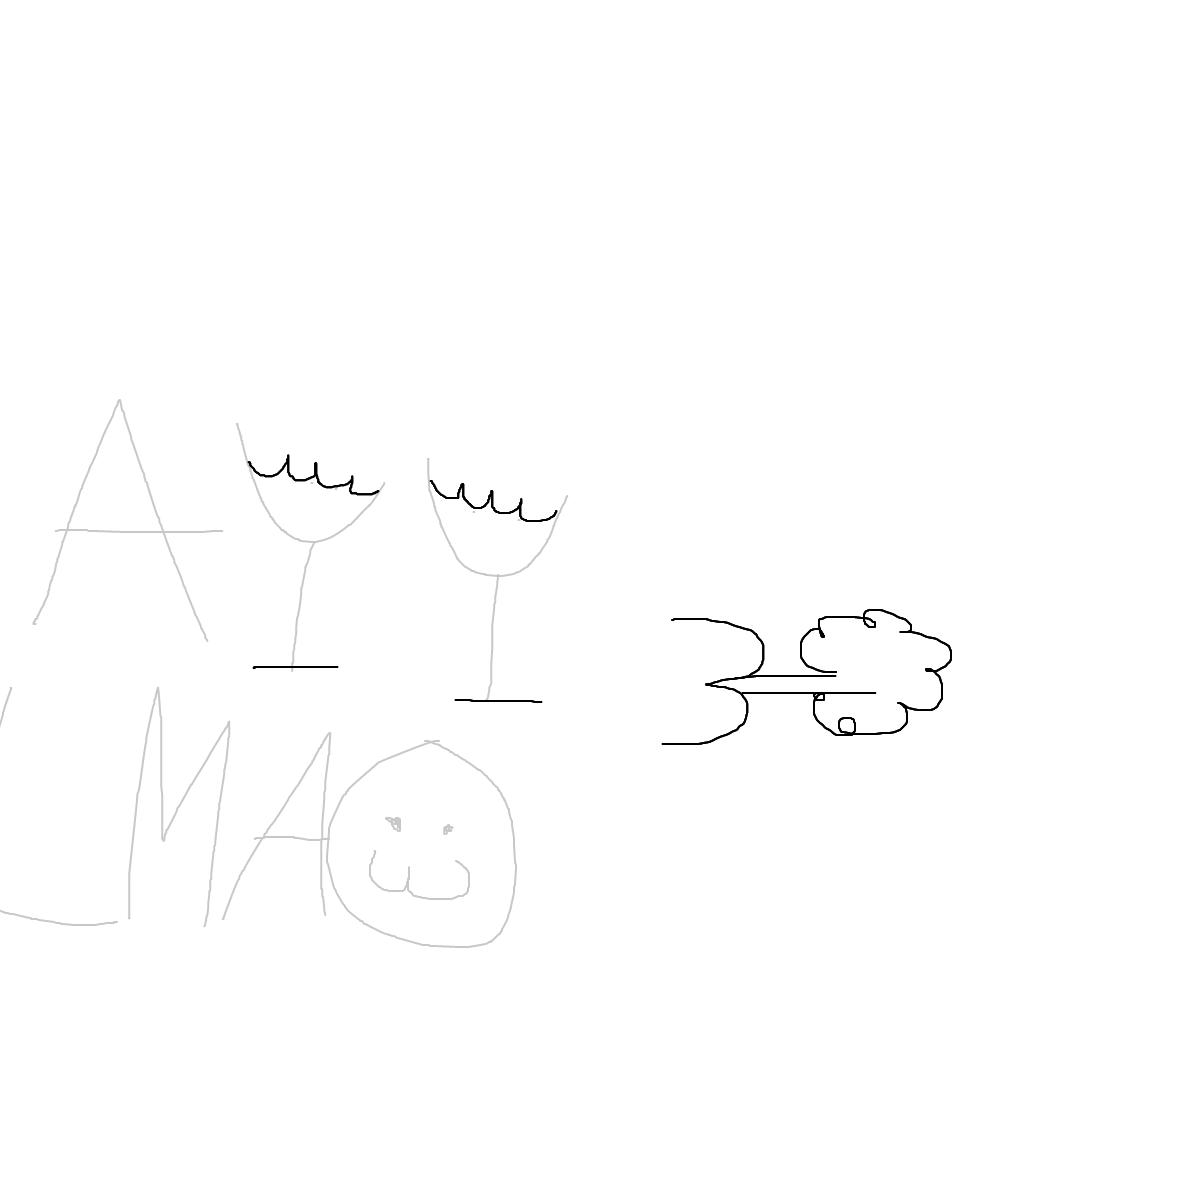 BAAAM drawing#8146 lat:47.2857894897460940lng: 8.6277313232421880